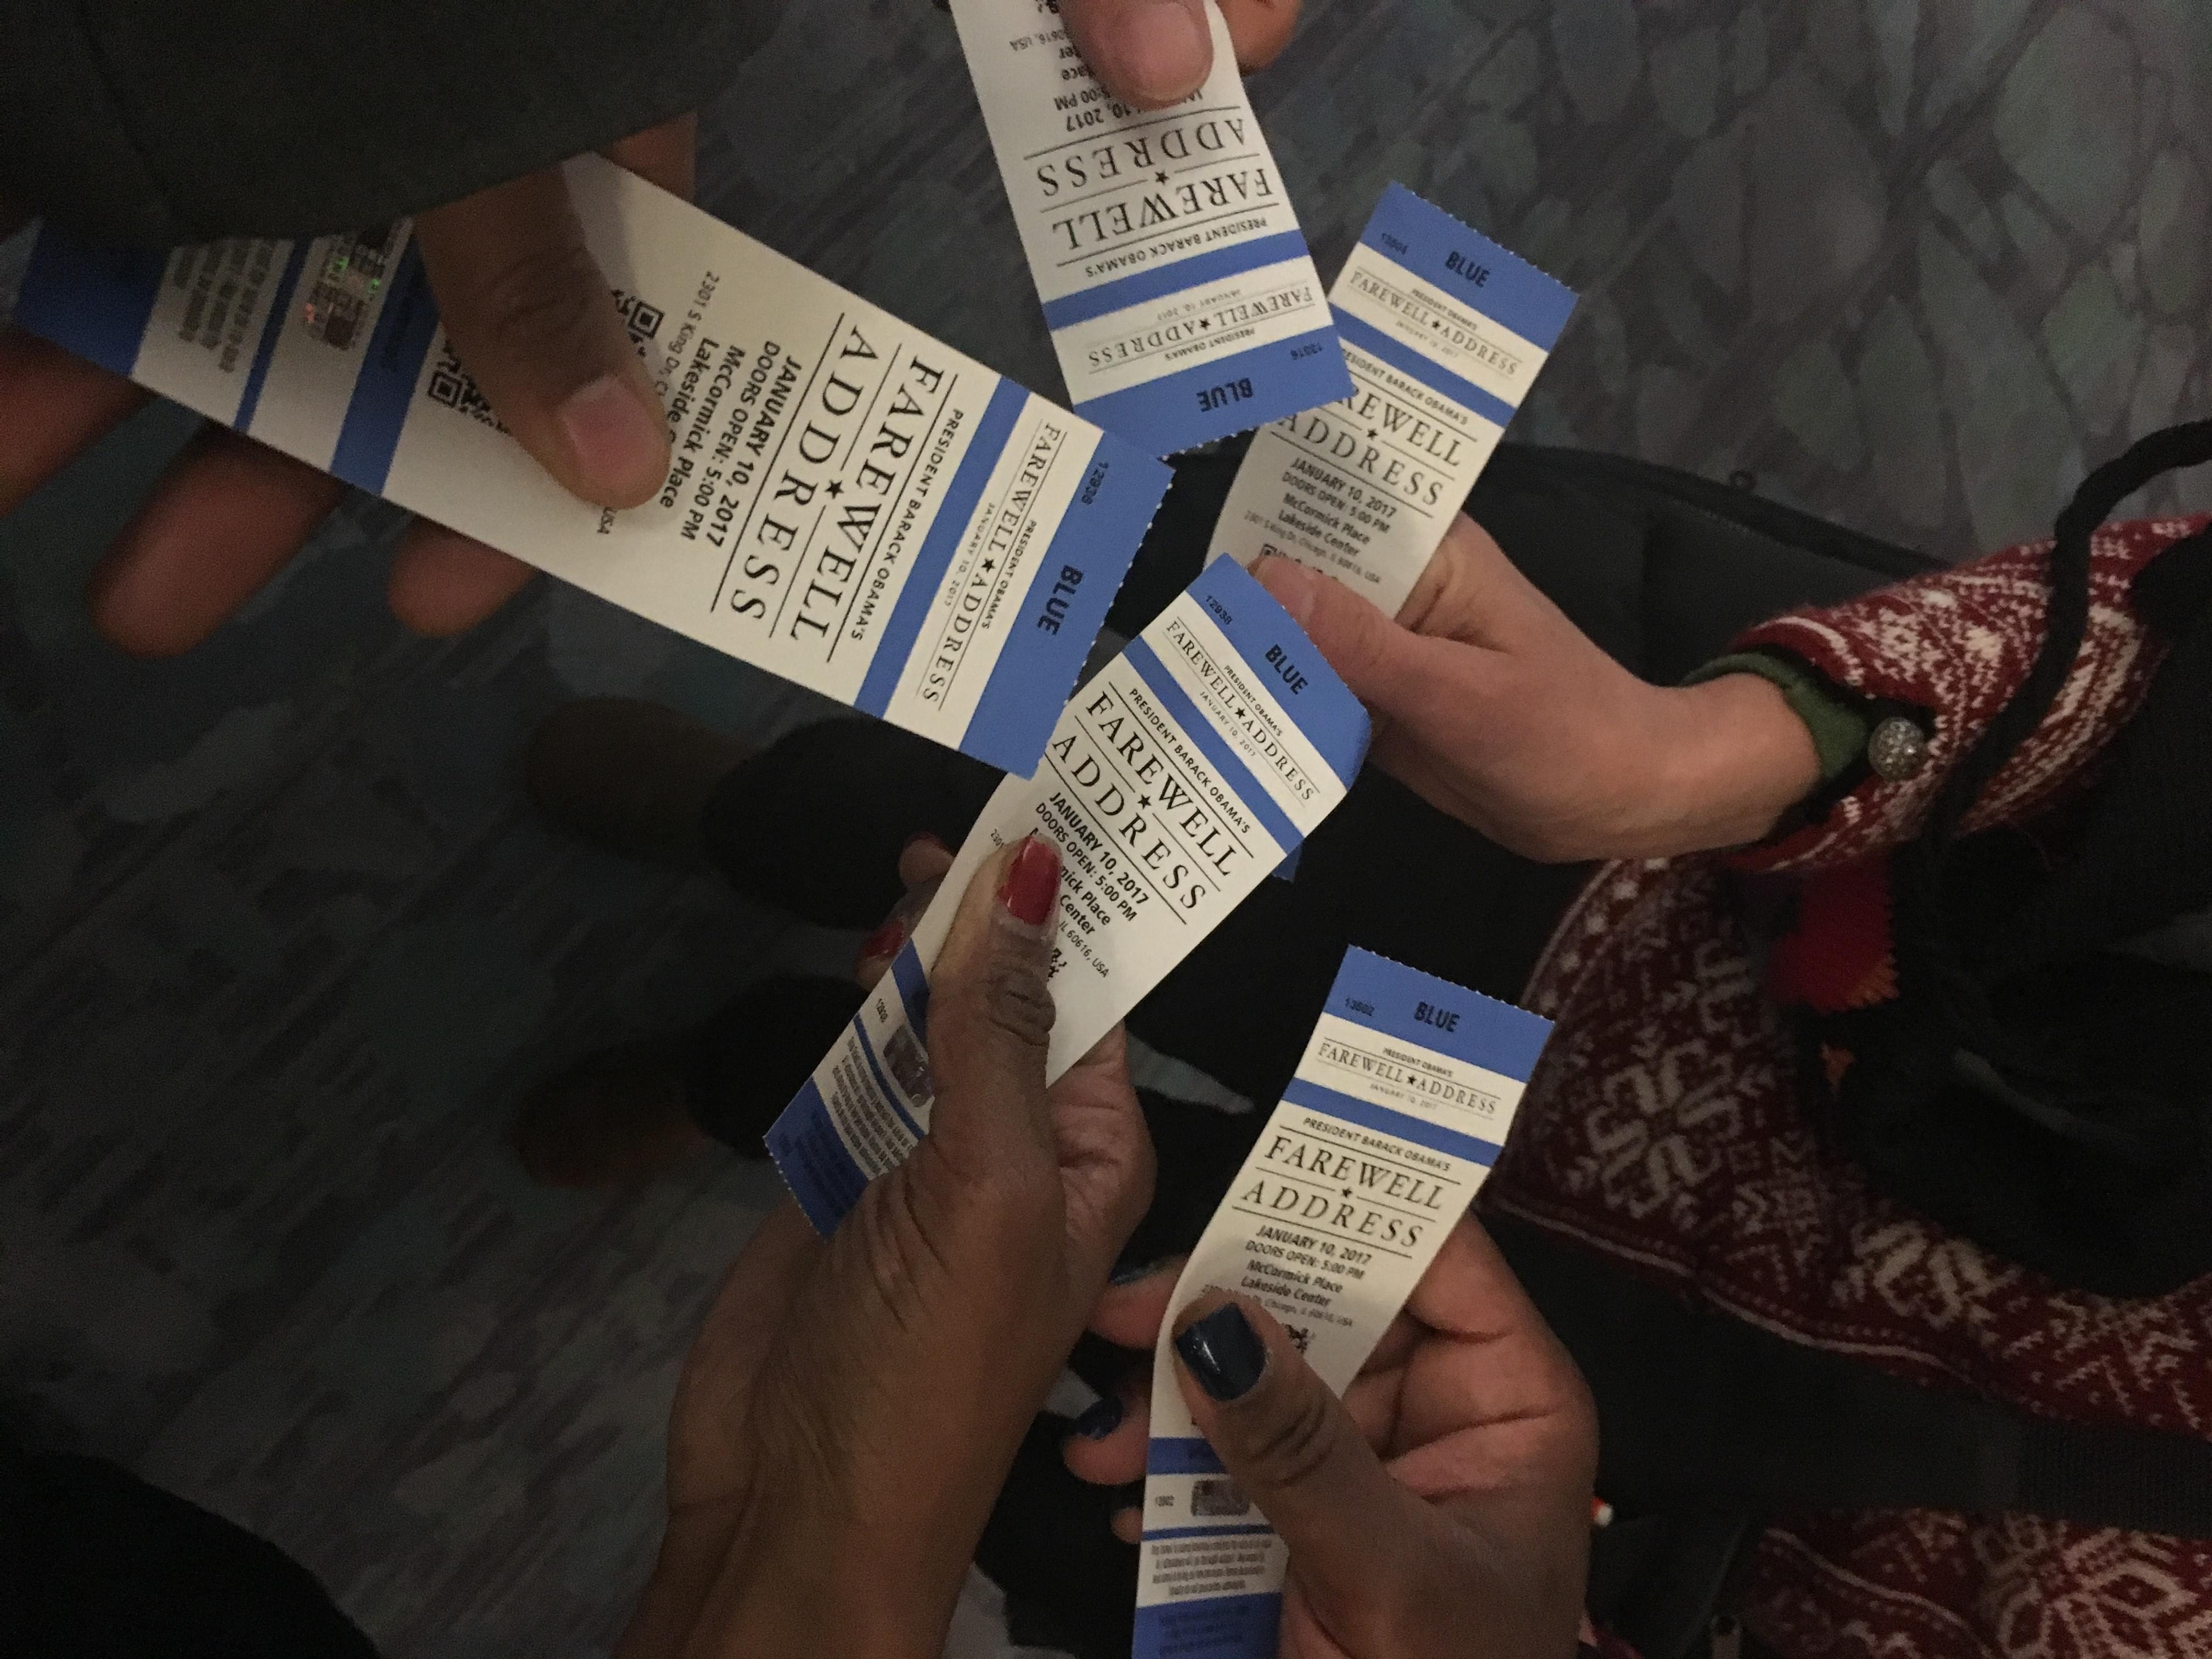 Obama farewell address tickets